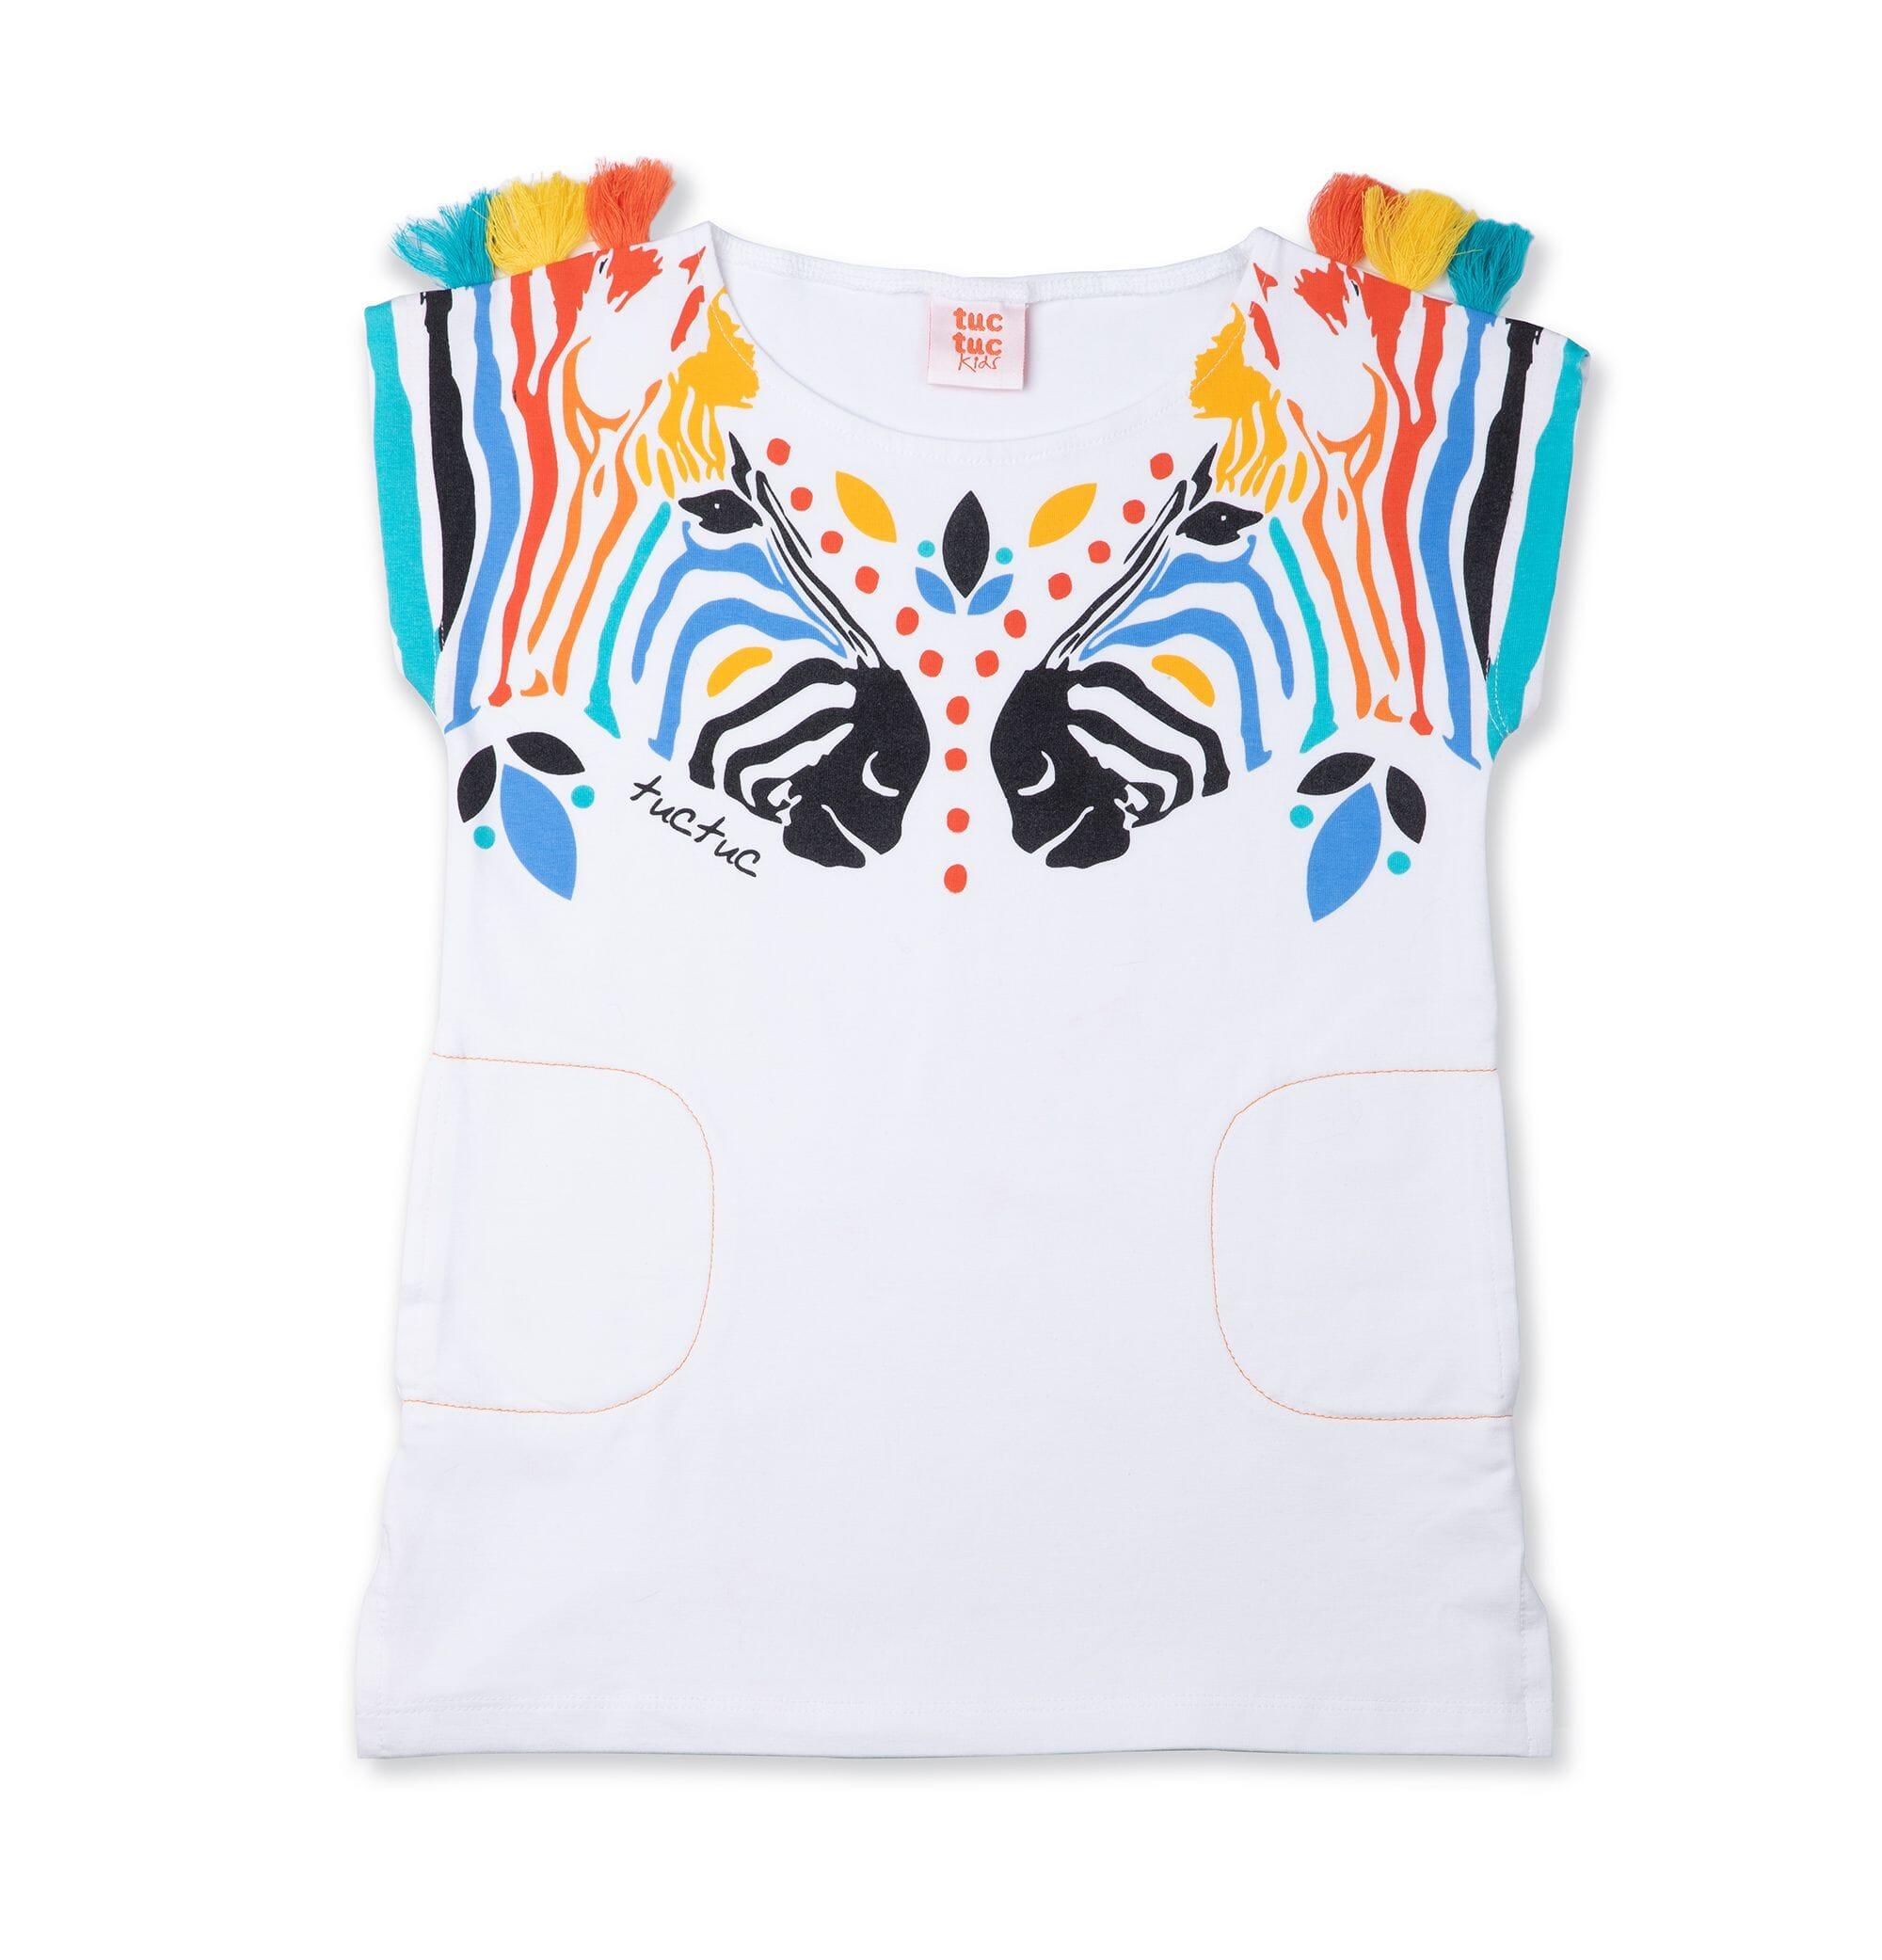 fotografia-ecommerce-en-alicante-camiseta-cebras